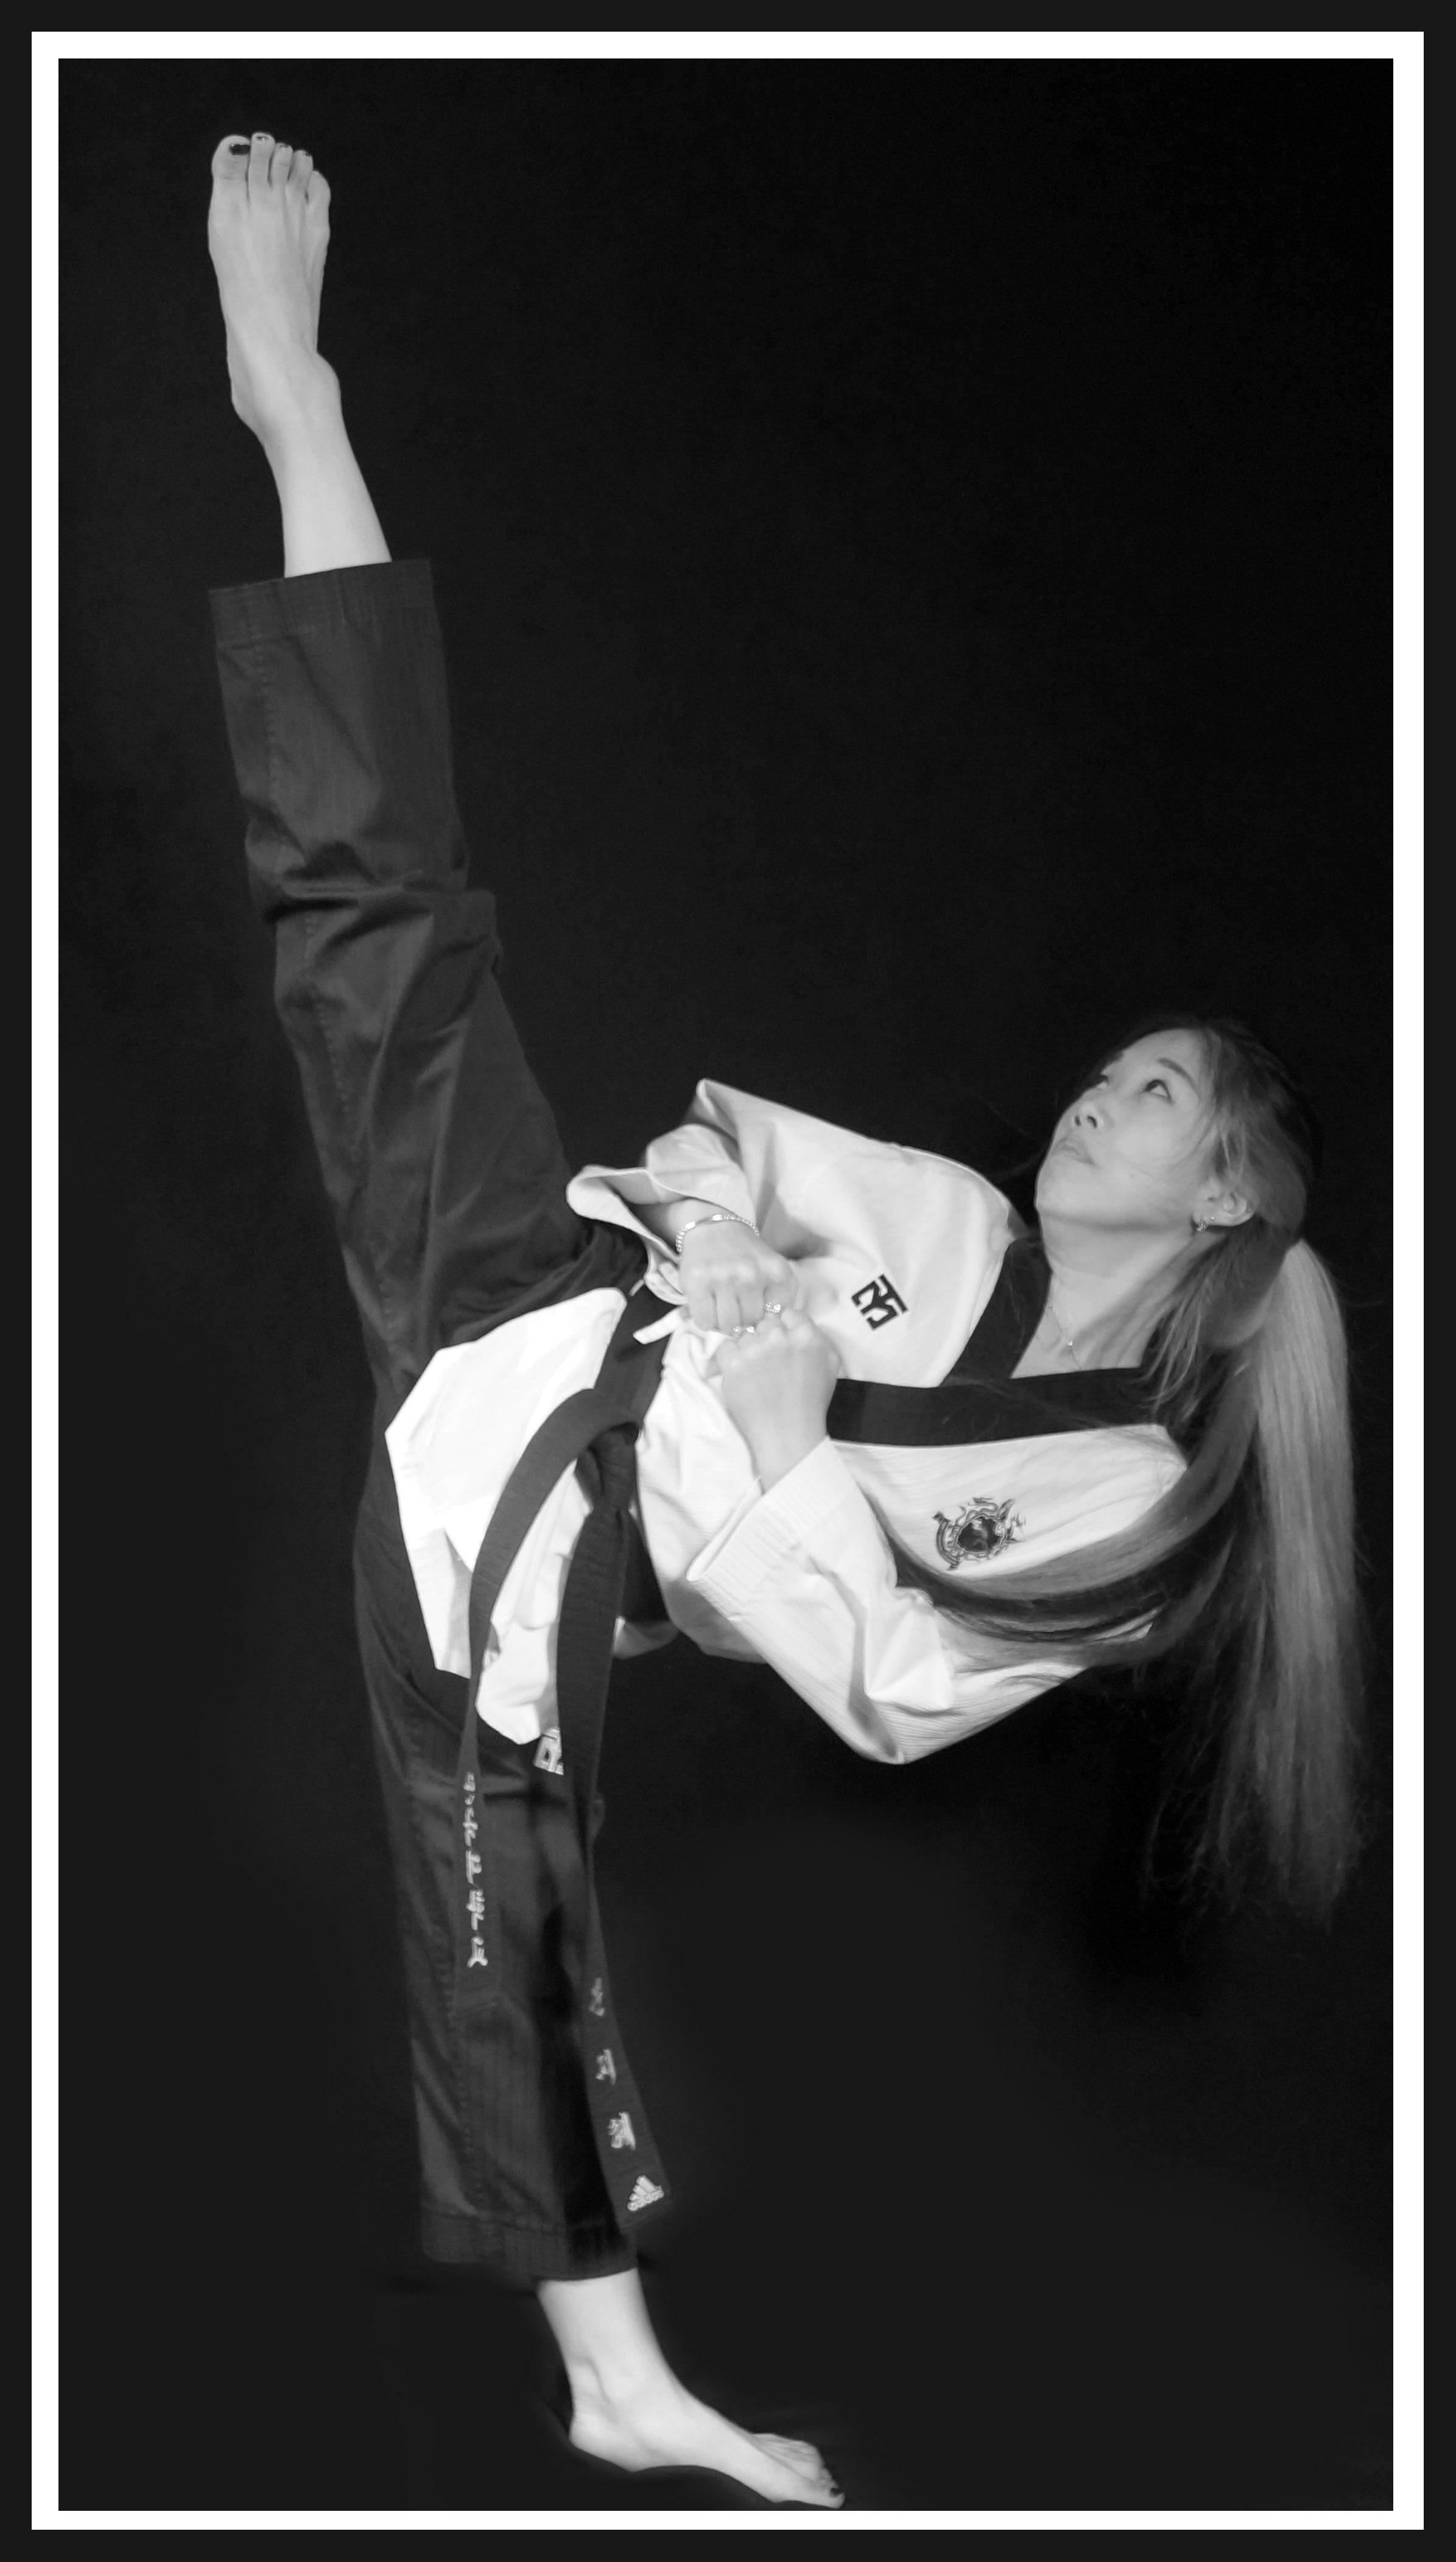 Master Moon - Korean Martial Arts Instructor, Korean Taekwondo champion